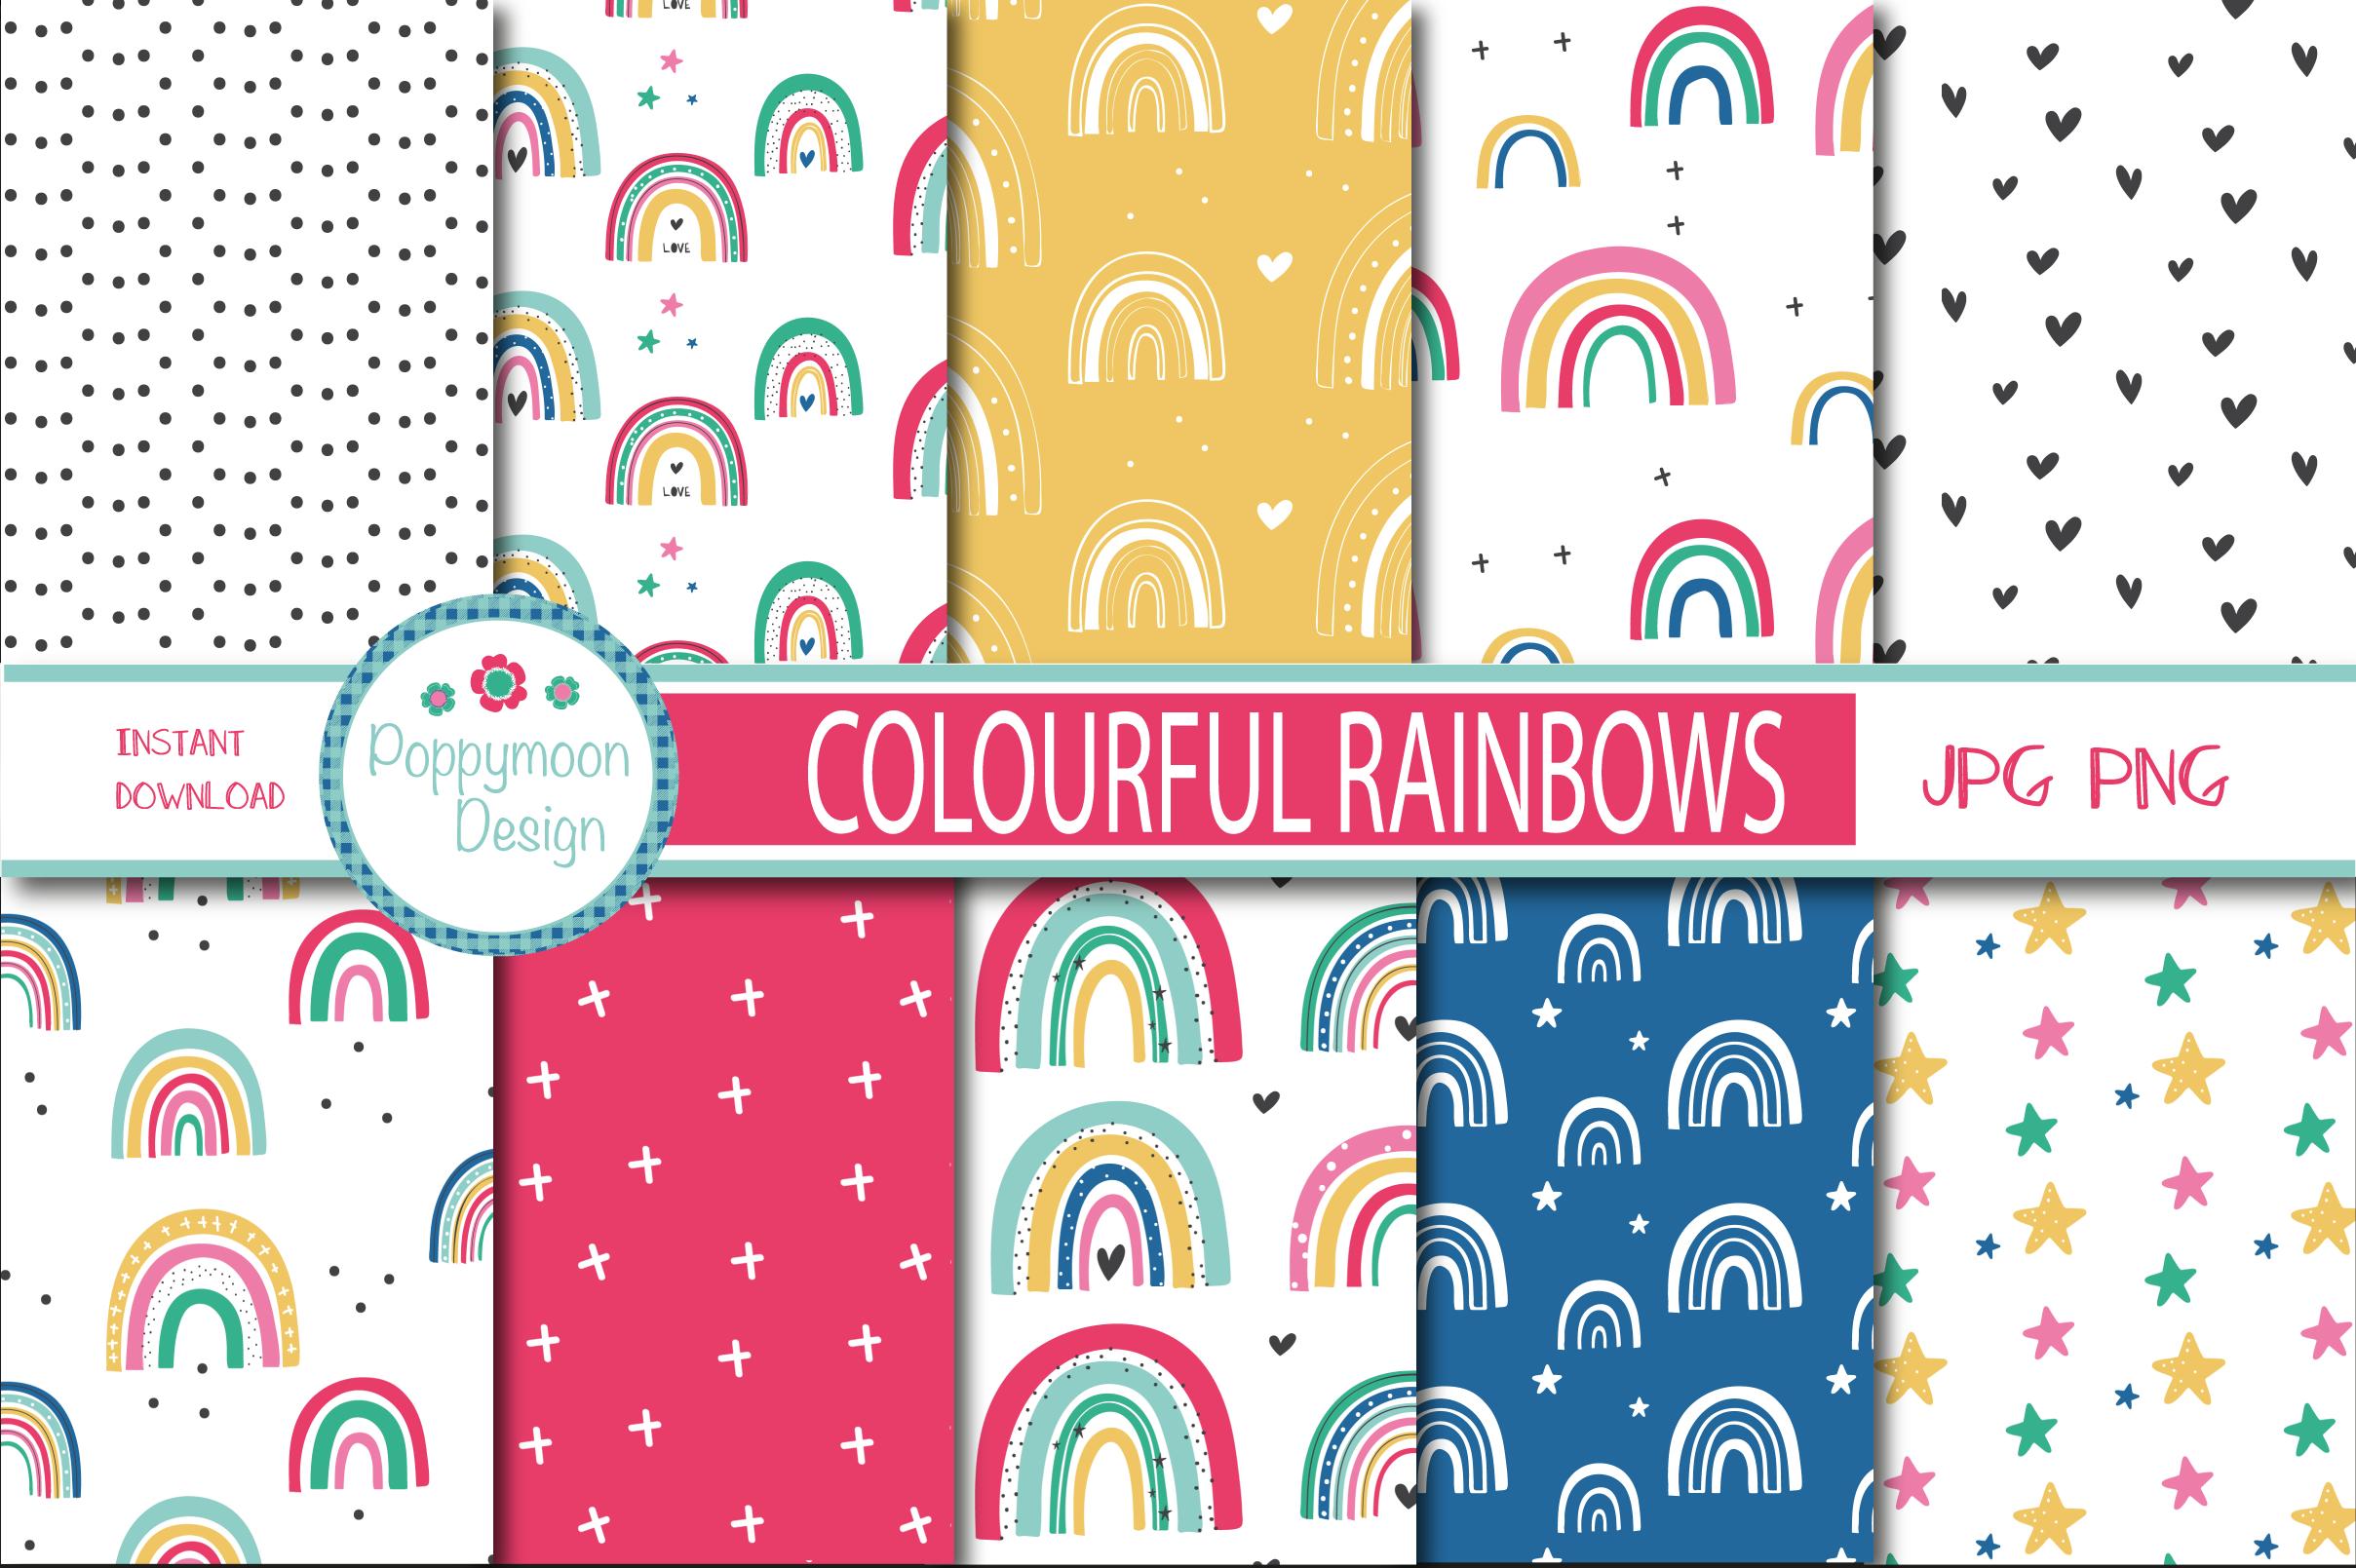 Colourful Rainbow Paper By Poppymoon Design Thehungryjpeg Com